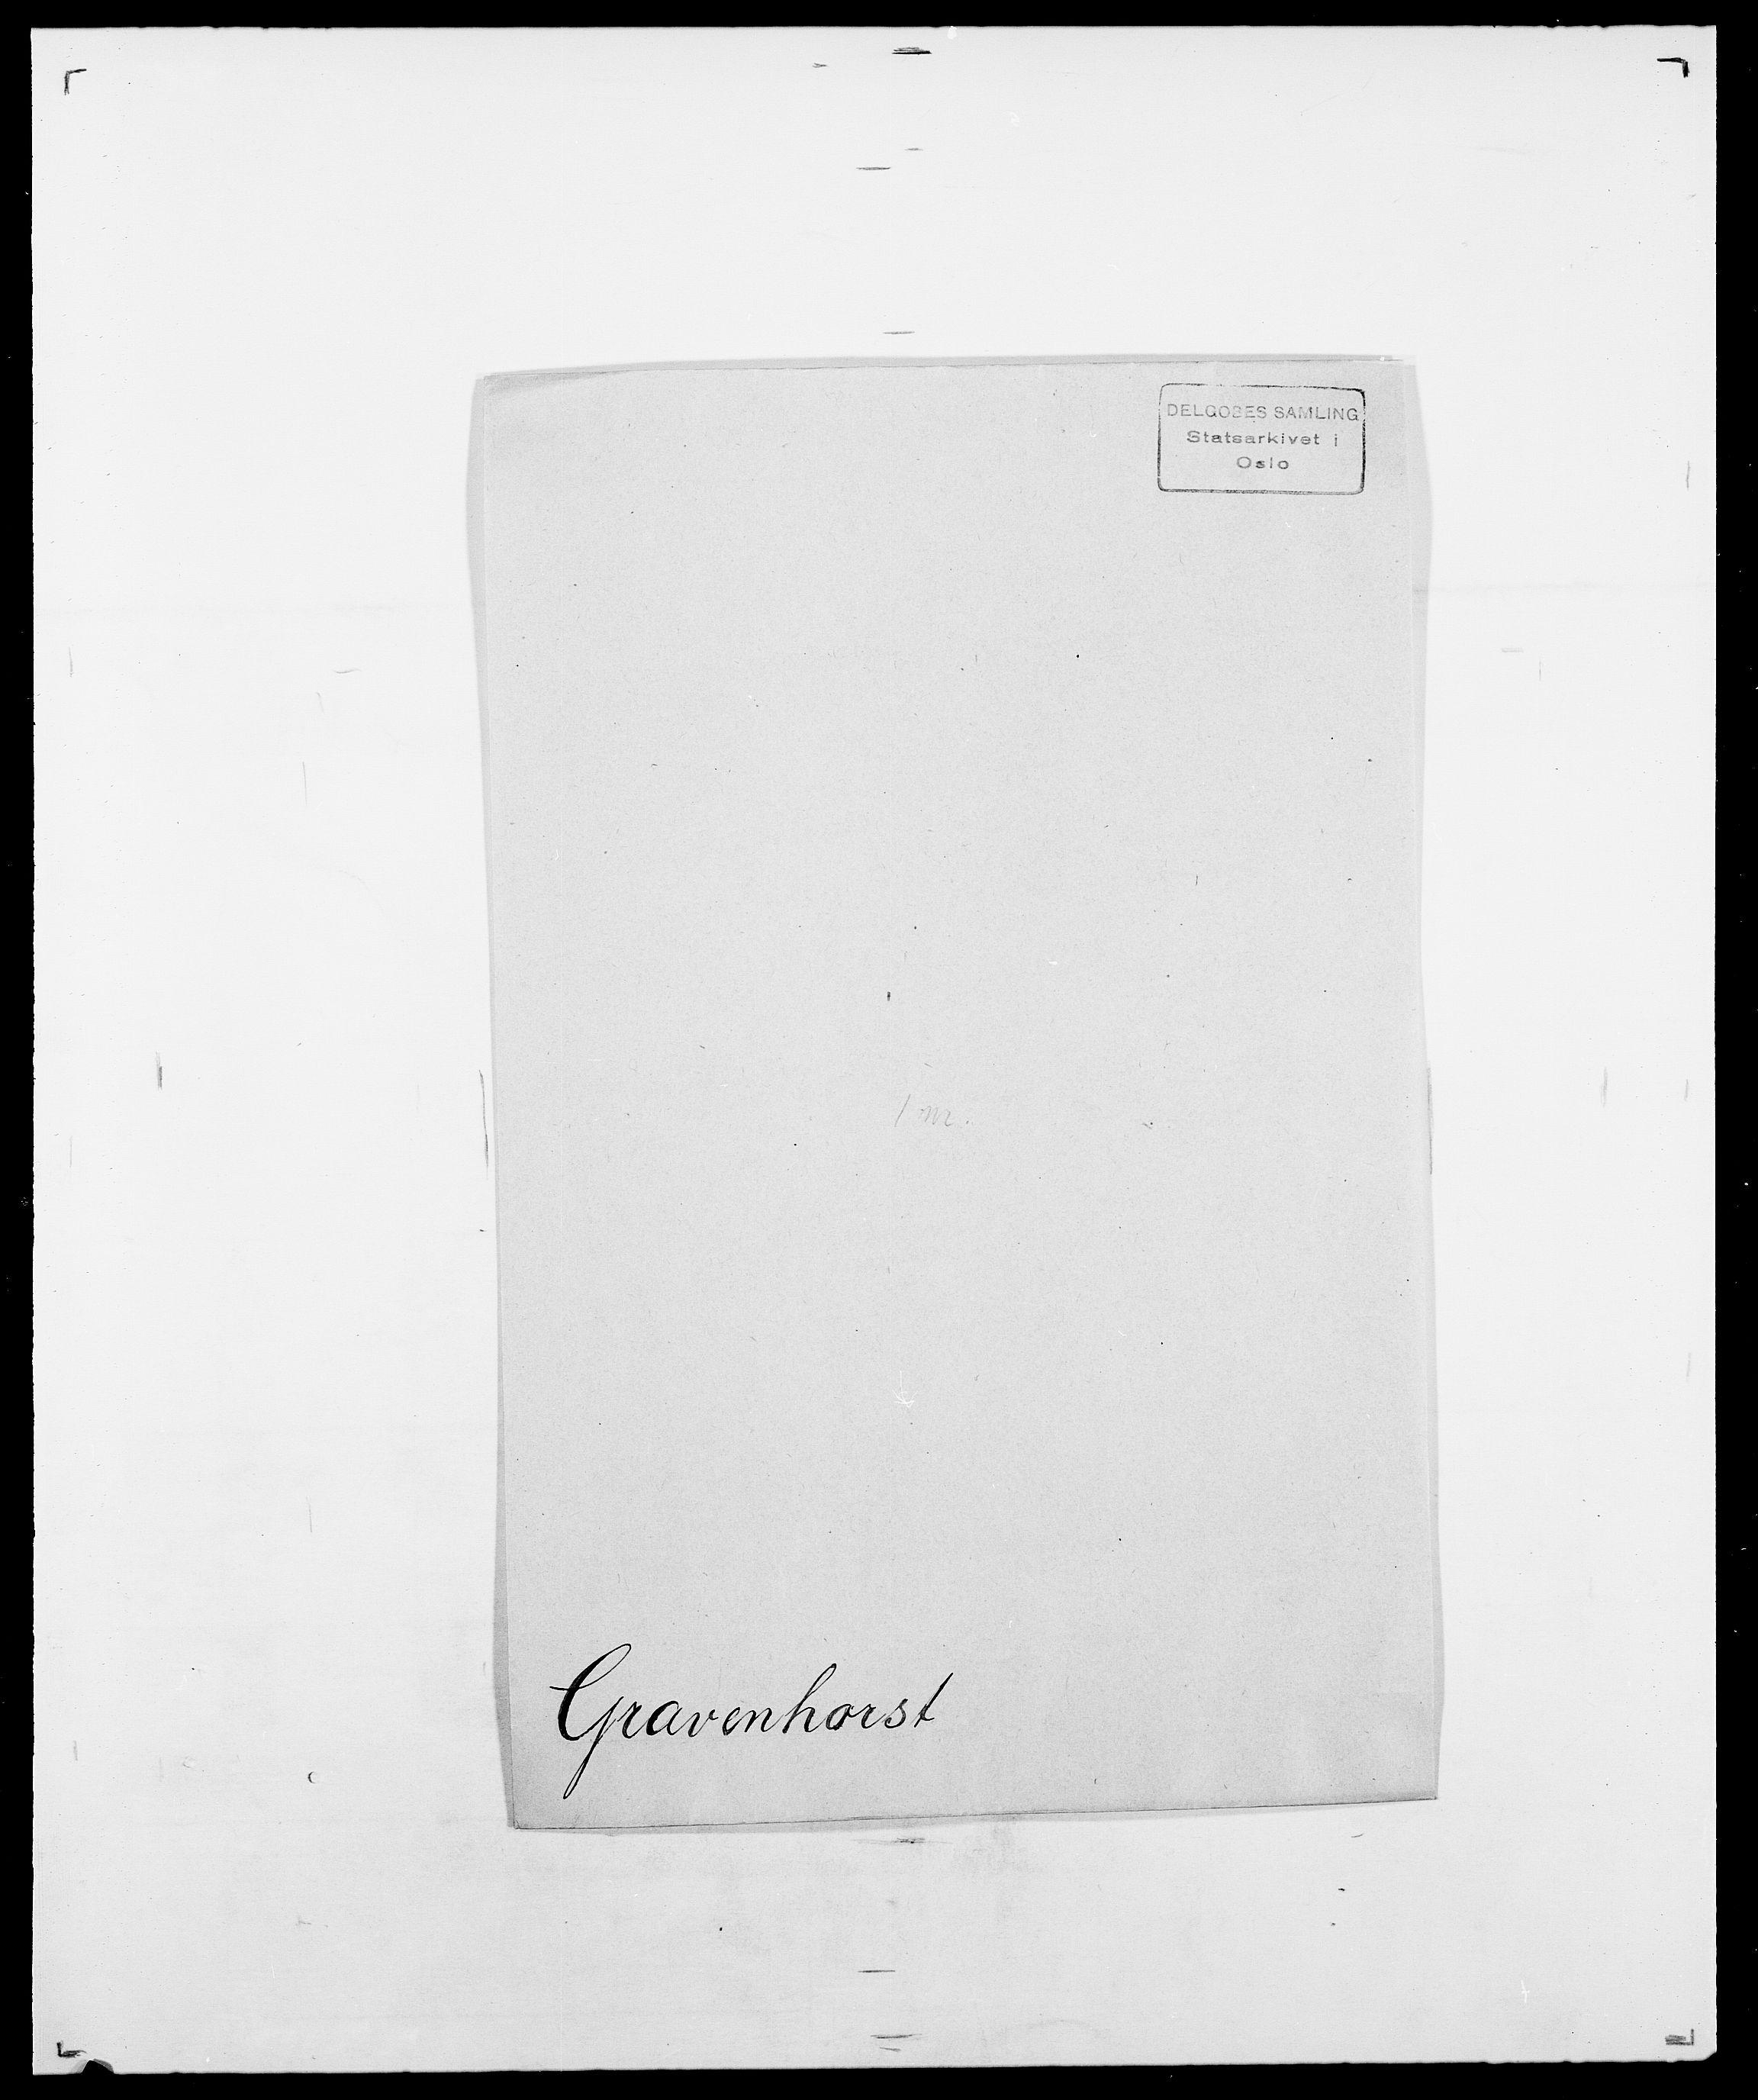 SAO, Delgobe, Charles Antoine - samling, D/Da/L0014: Giebdhausen - Grip, s. 564